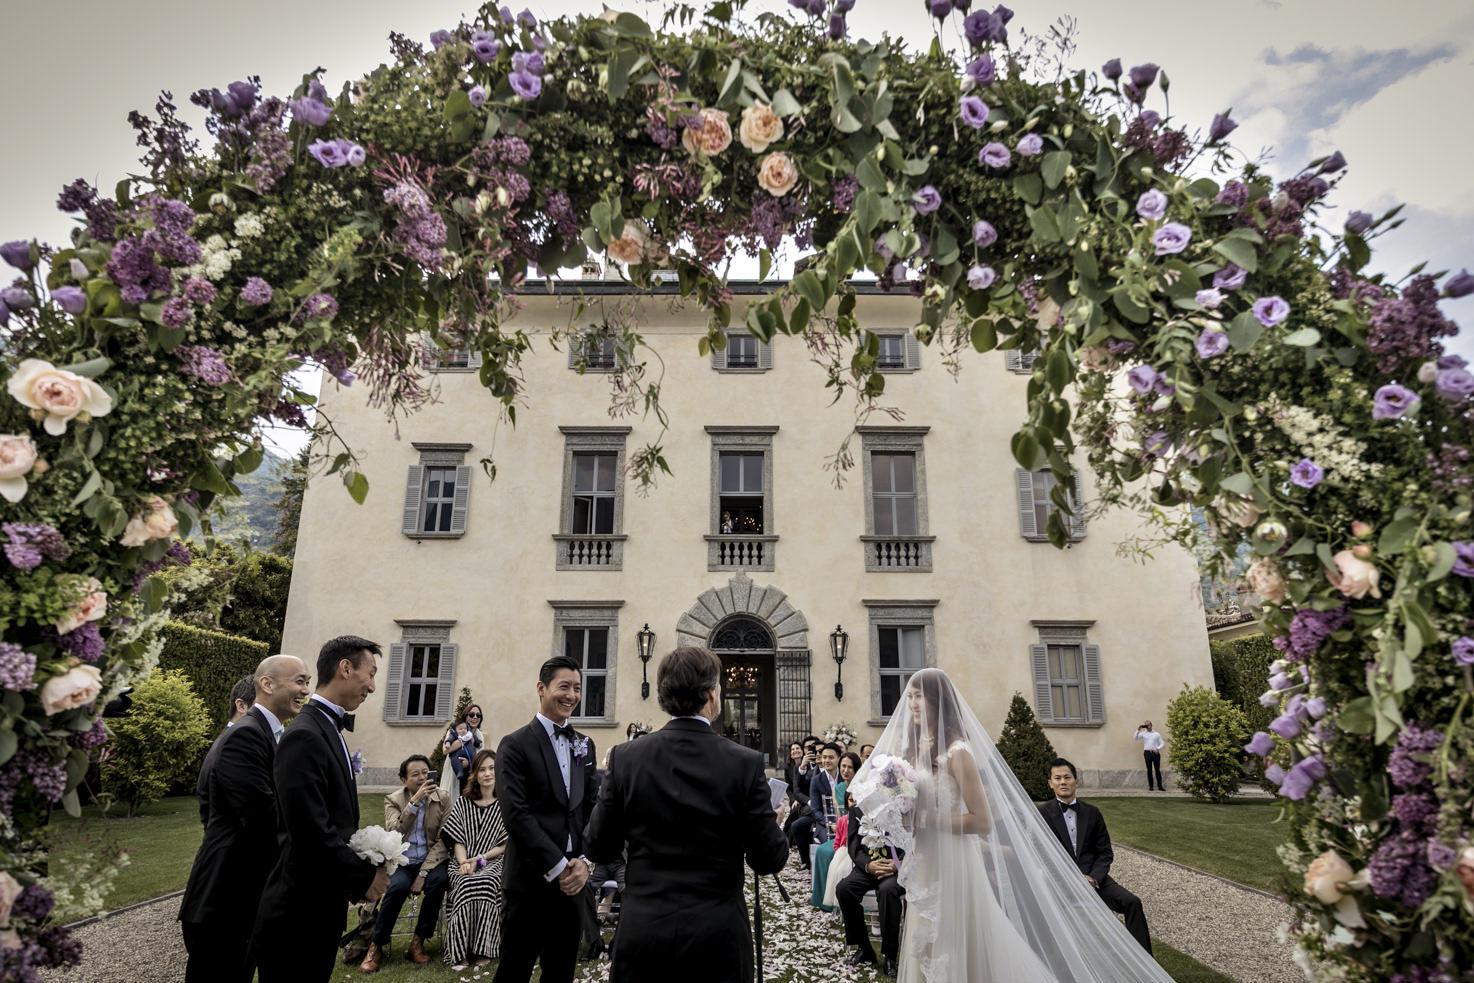 Wedding ceremony in the gardens of the Villa